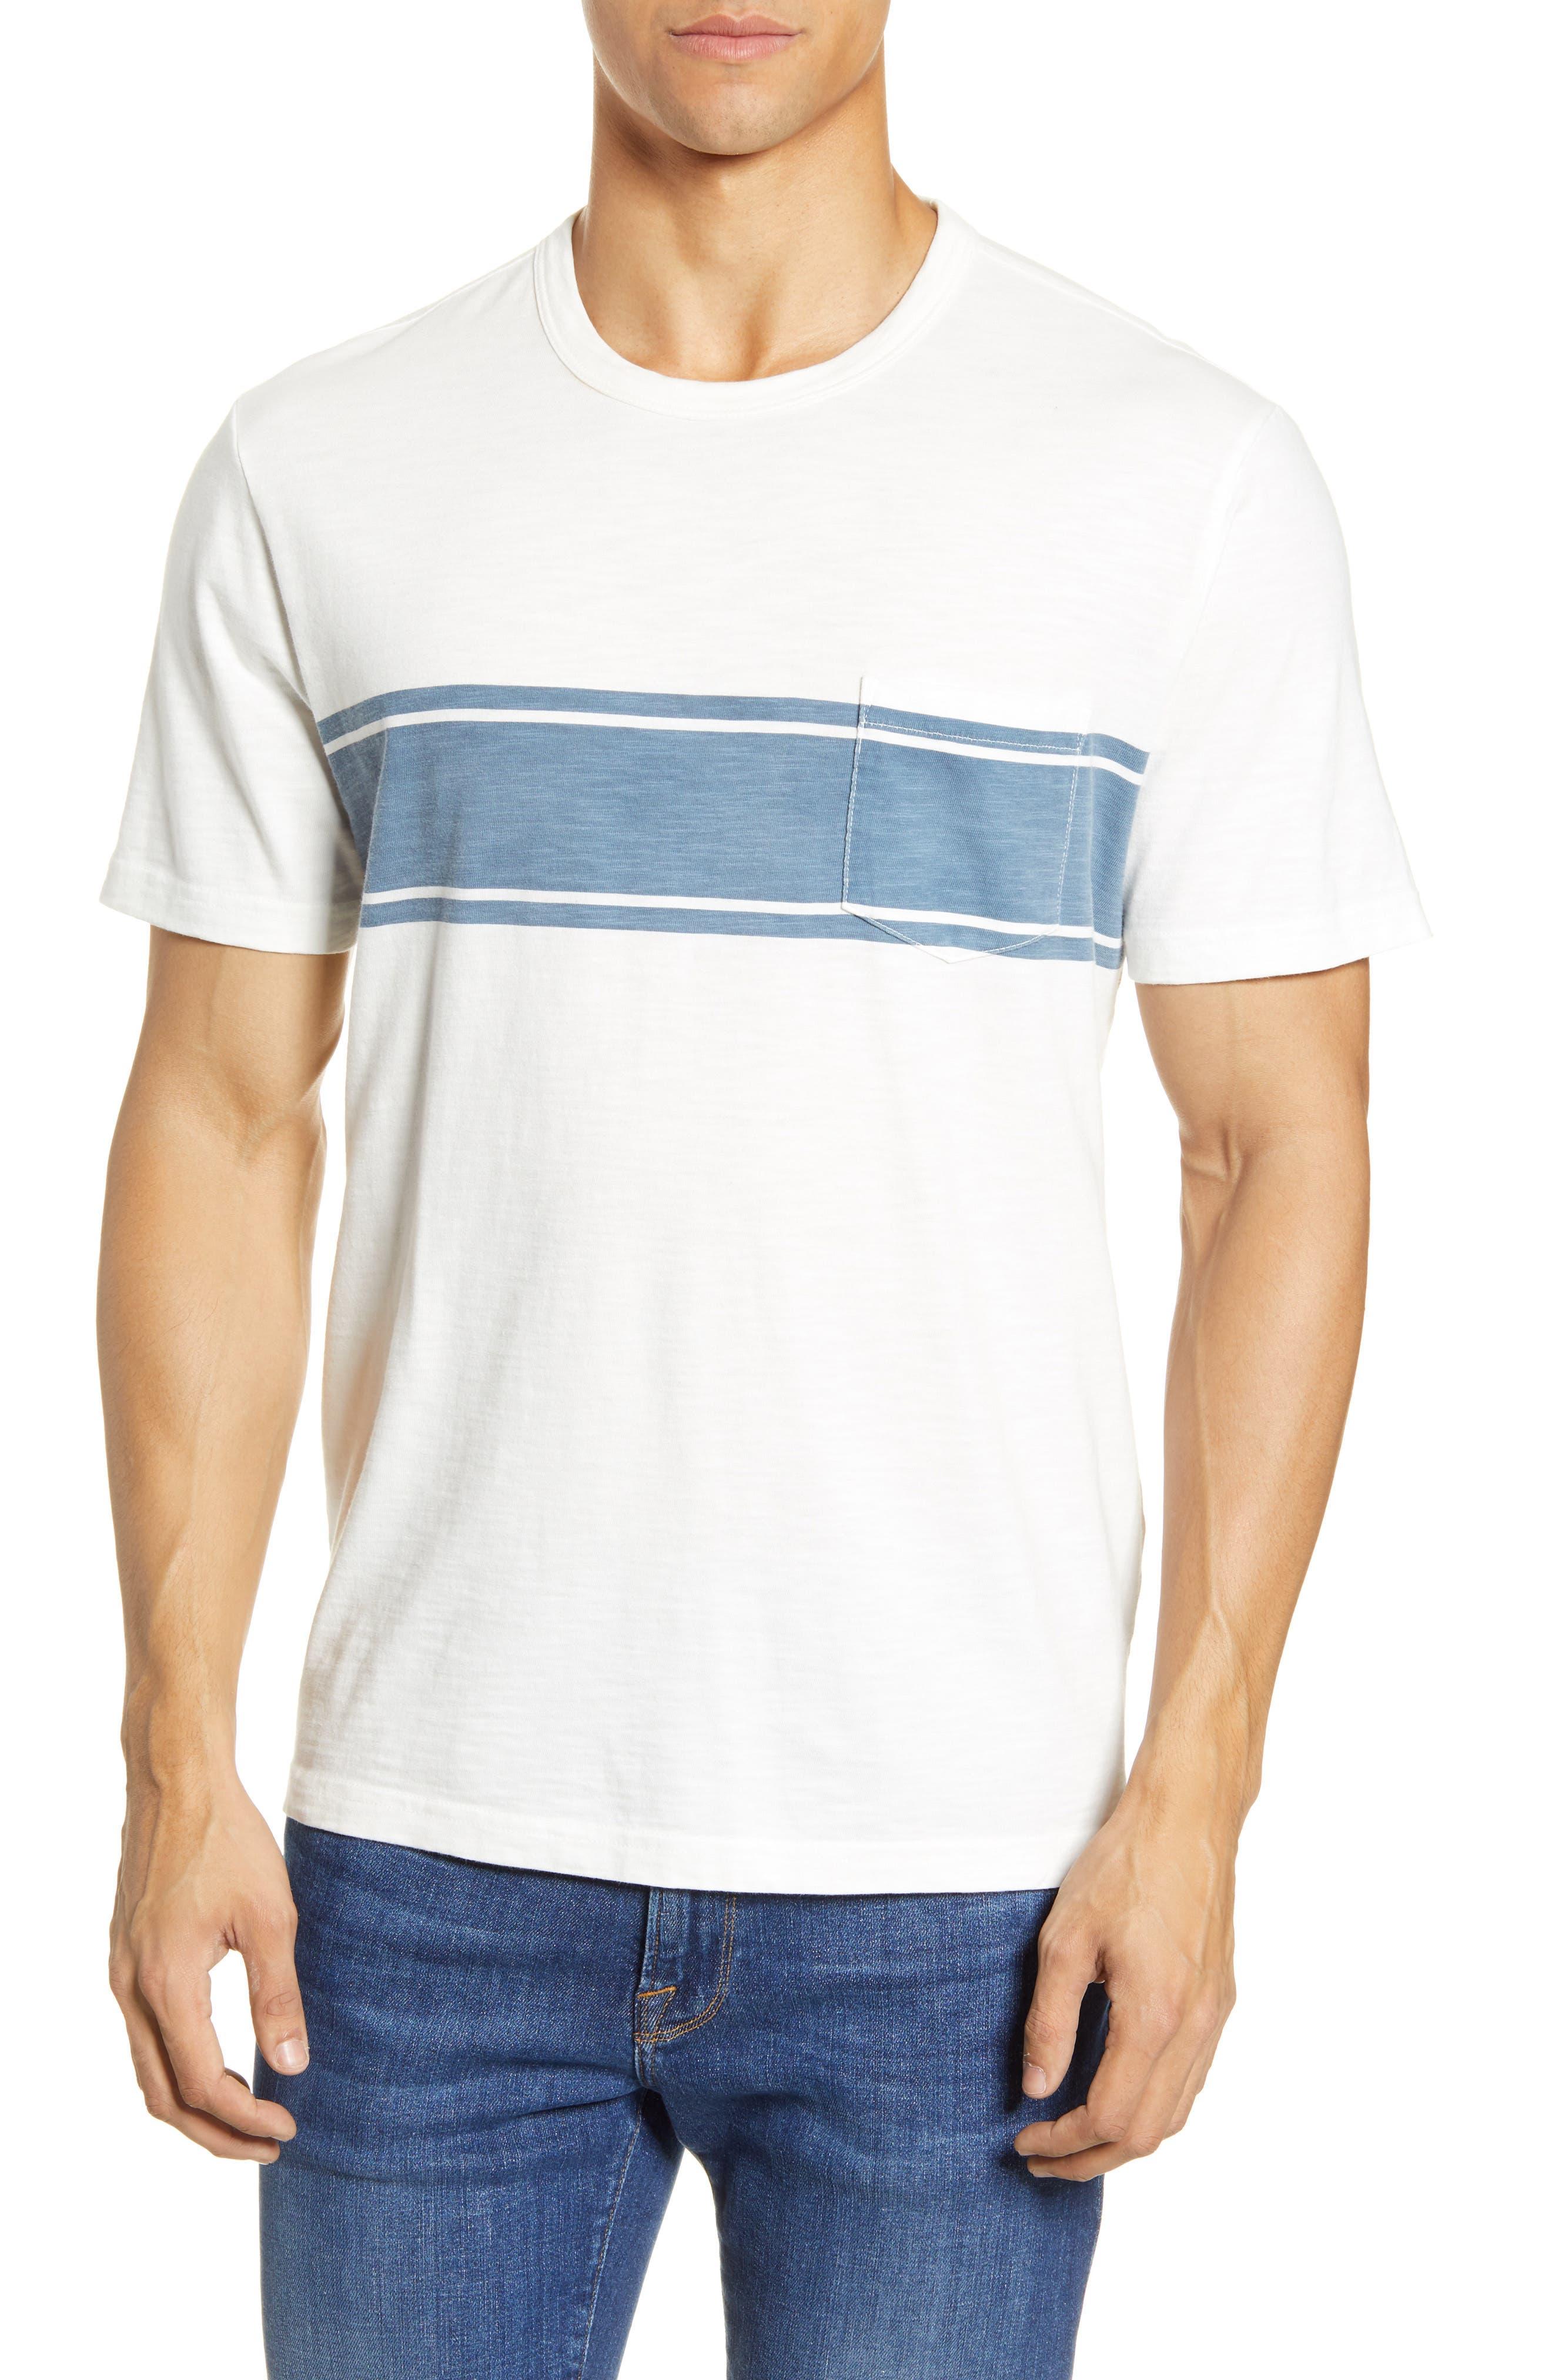 Surf Stripe Pocket T-Shirt